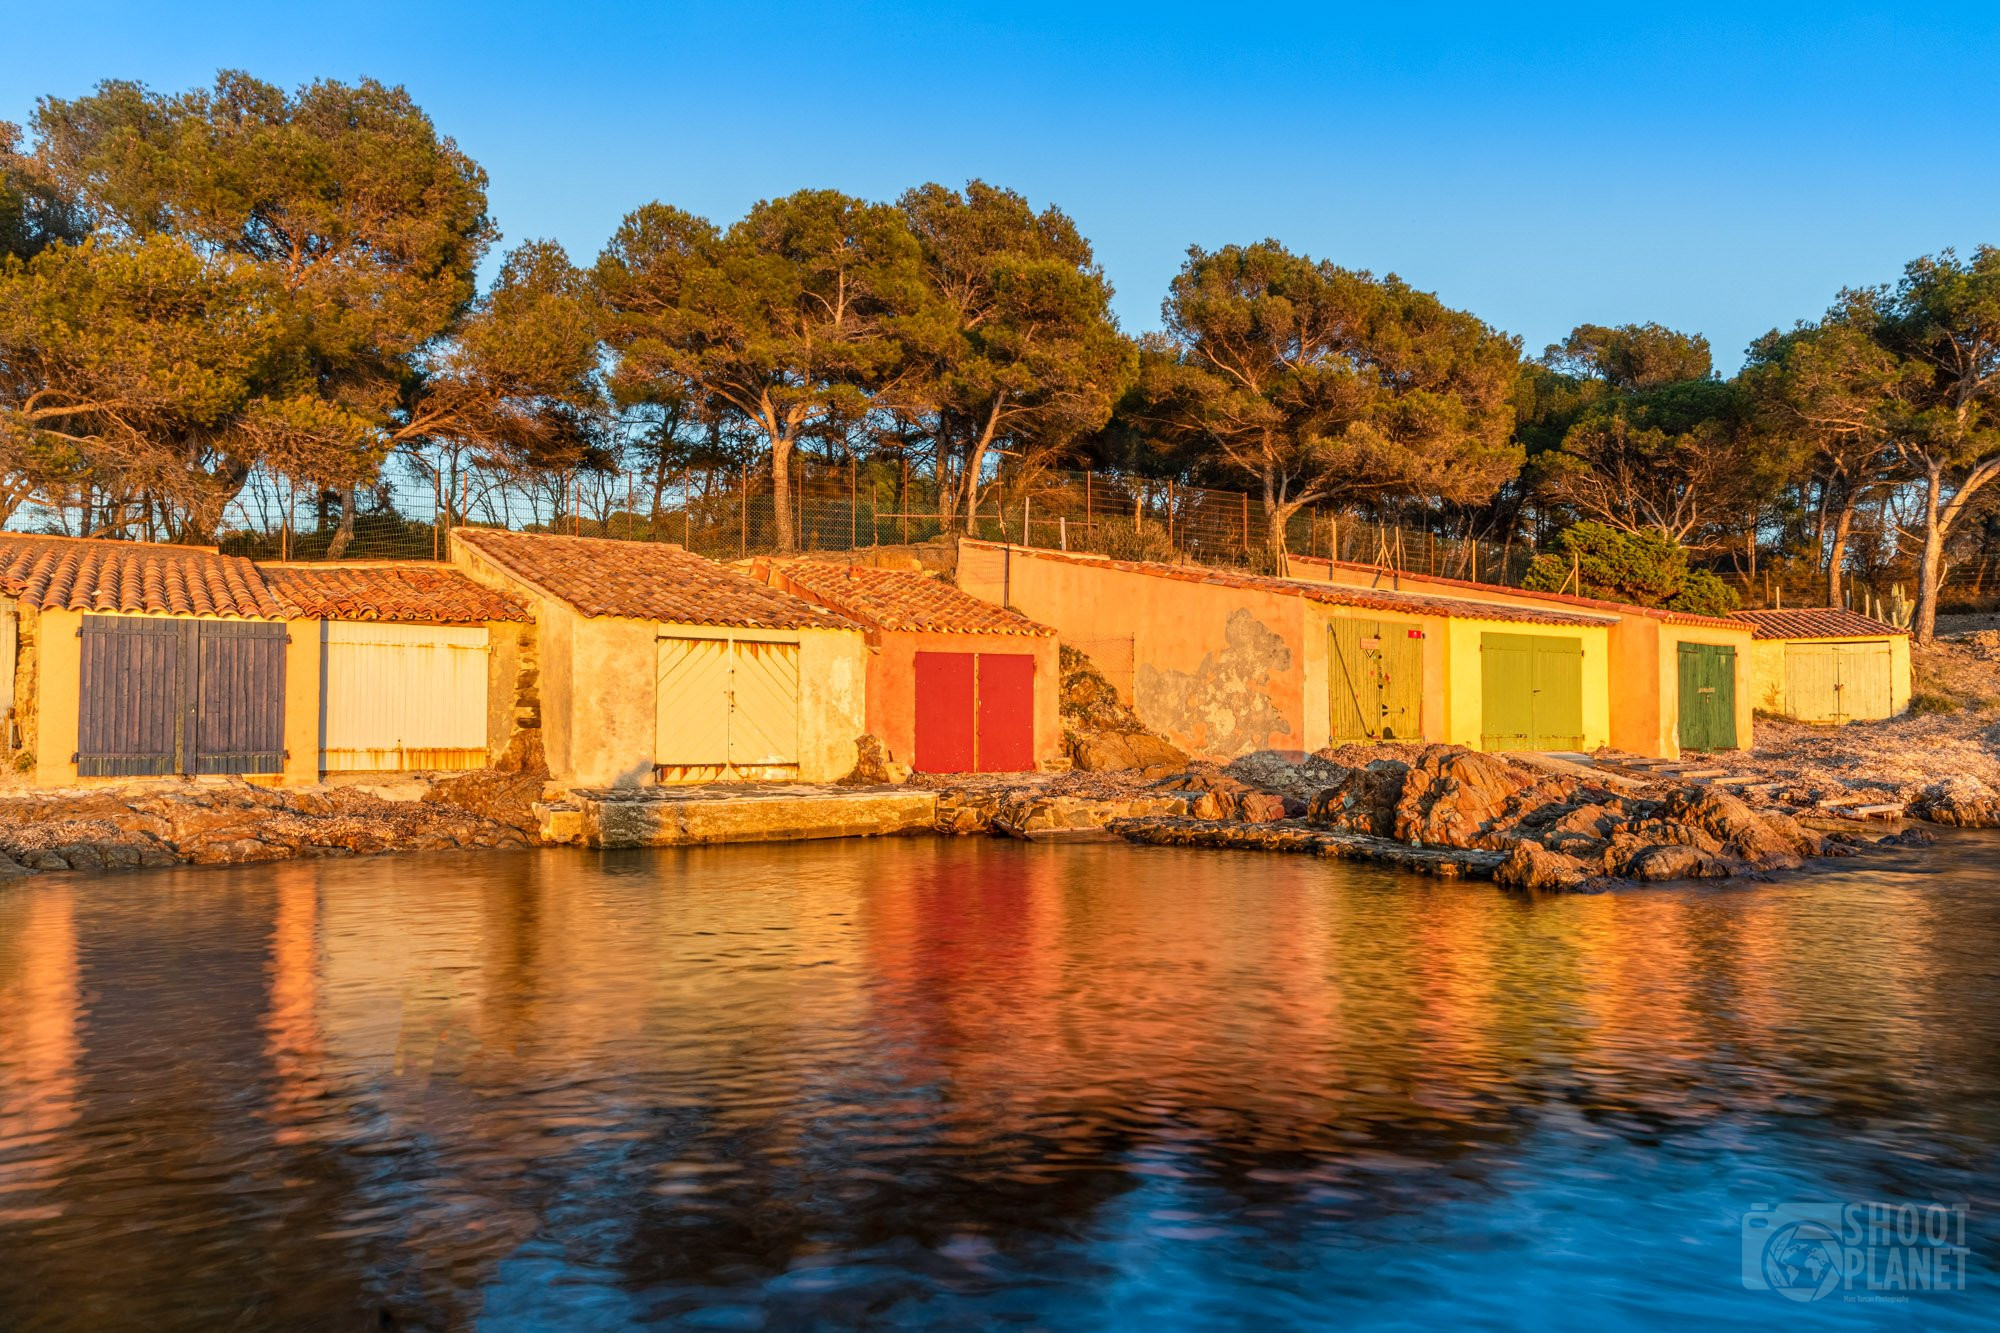 Bregançon beach fisherman's houses, France